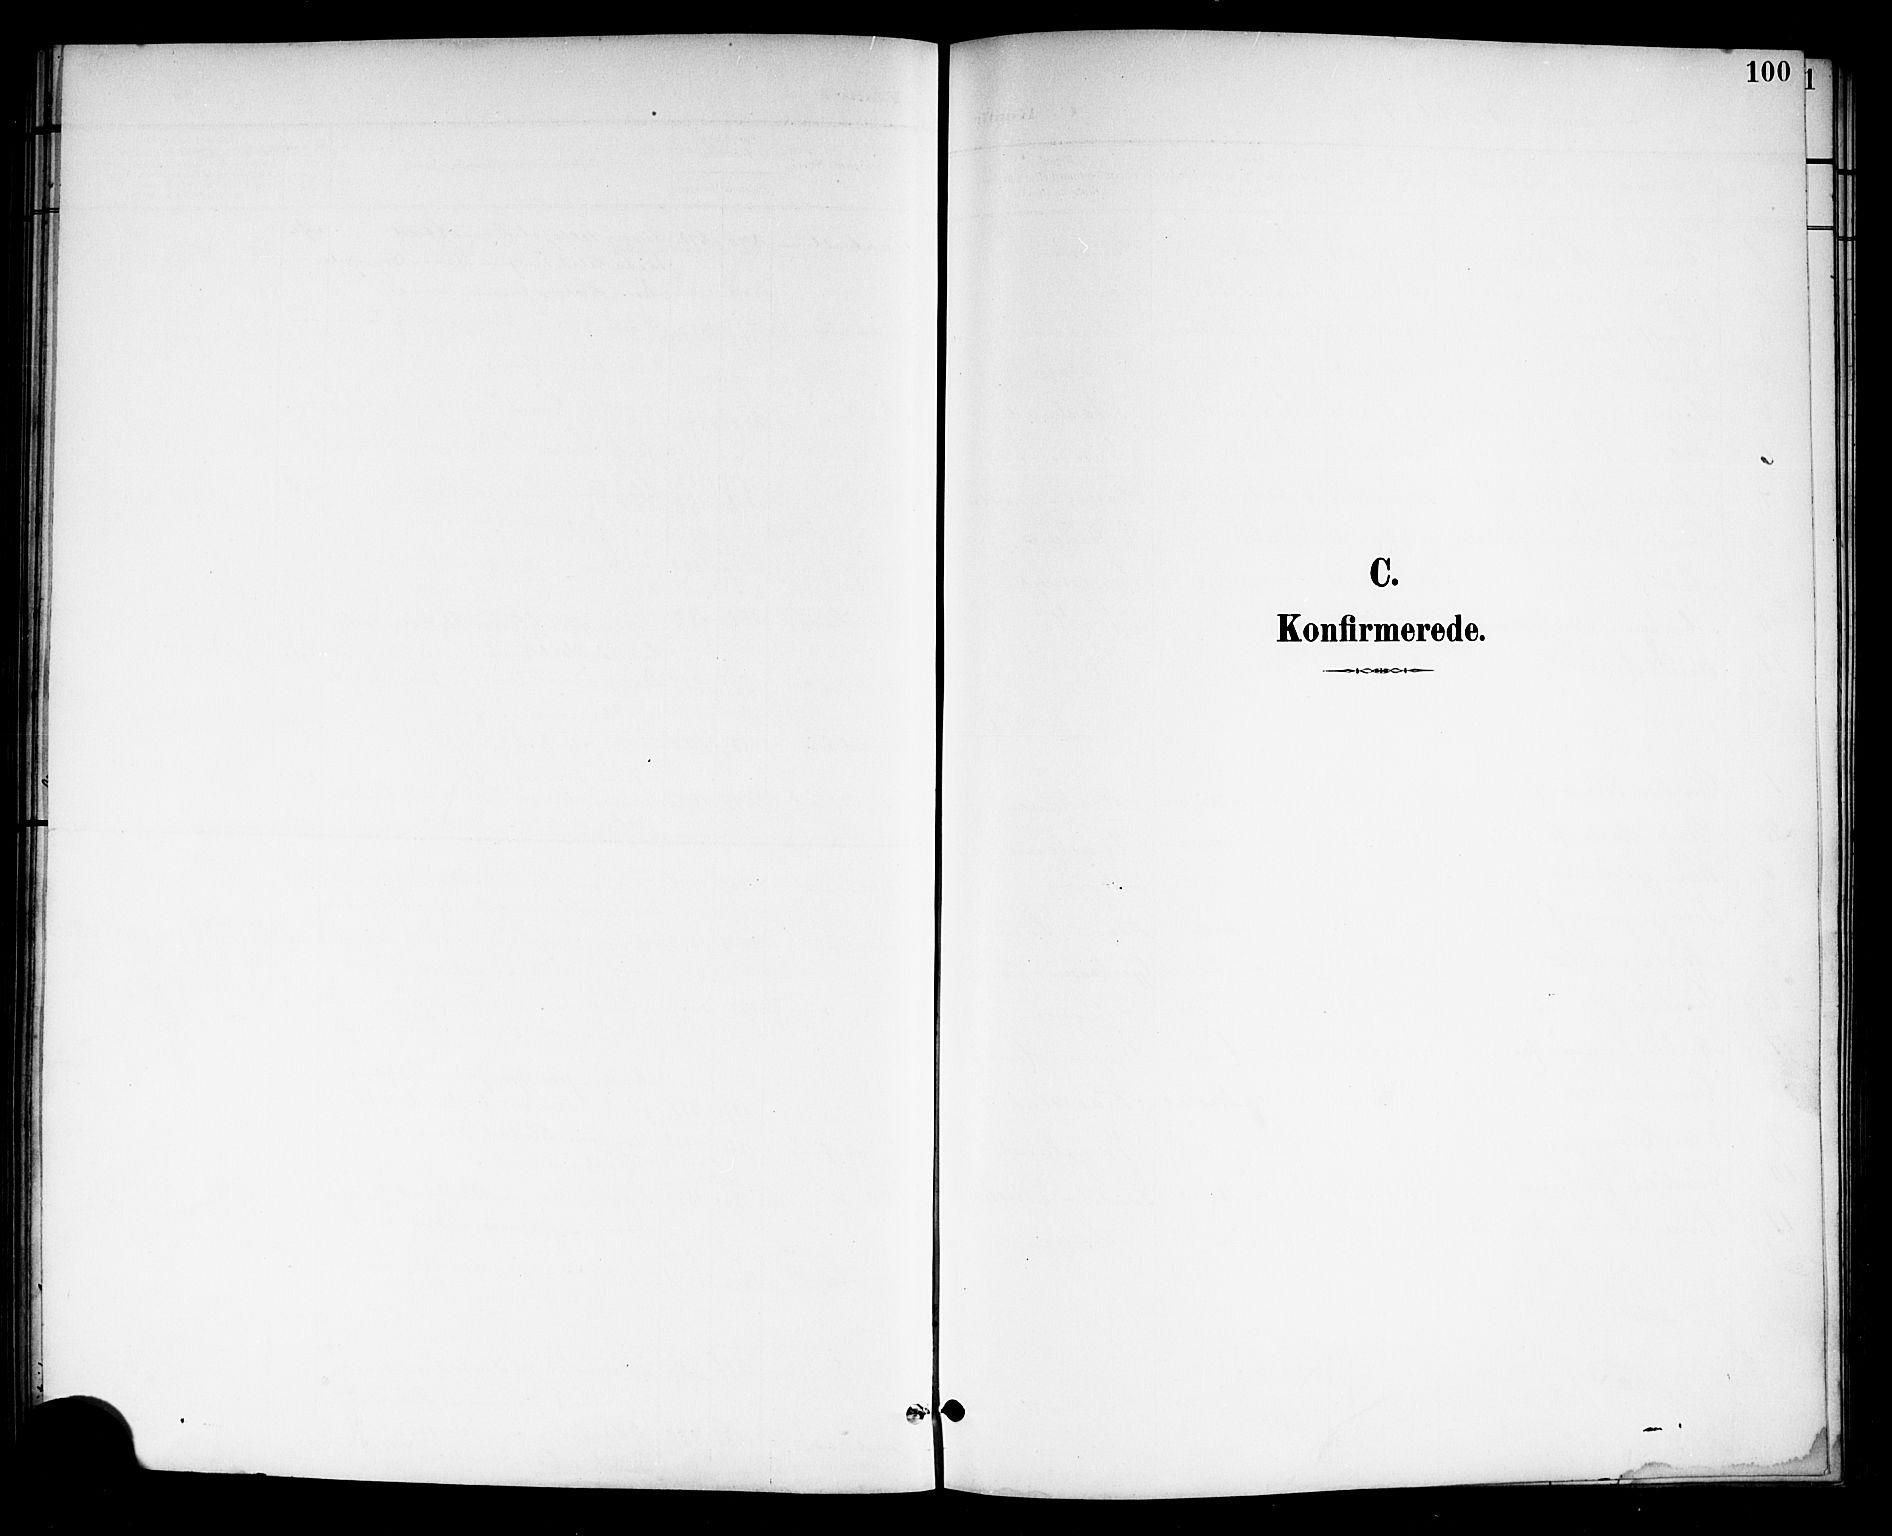 SAKO, Drangedal kirkebøker, G/Gb/L0002: Klokkerbok nr. II 2, 1895-1918, s. 100